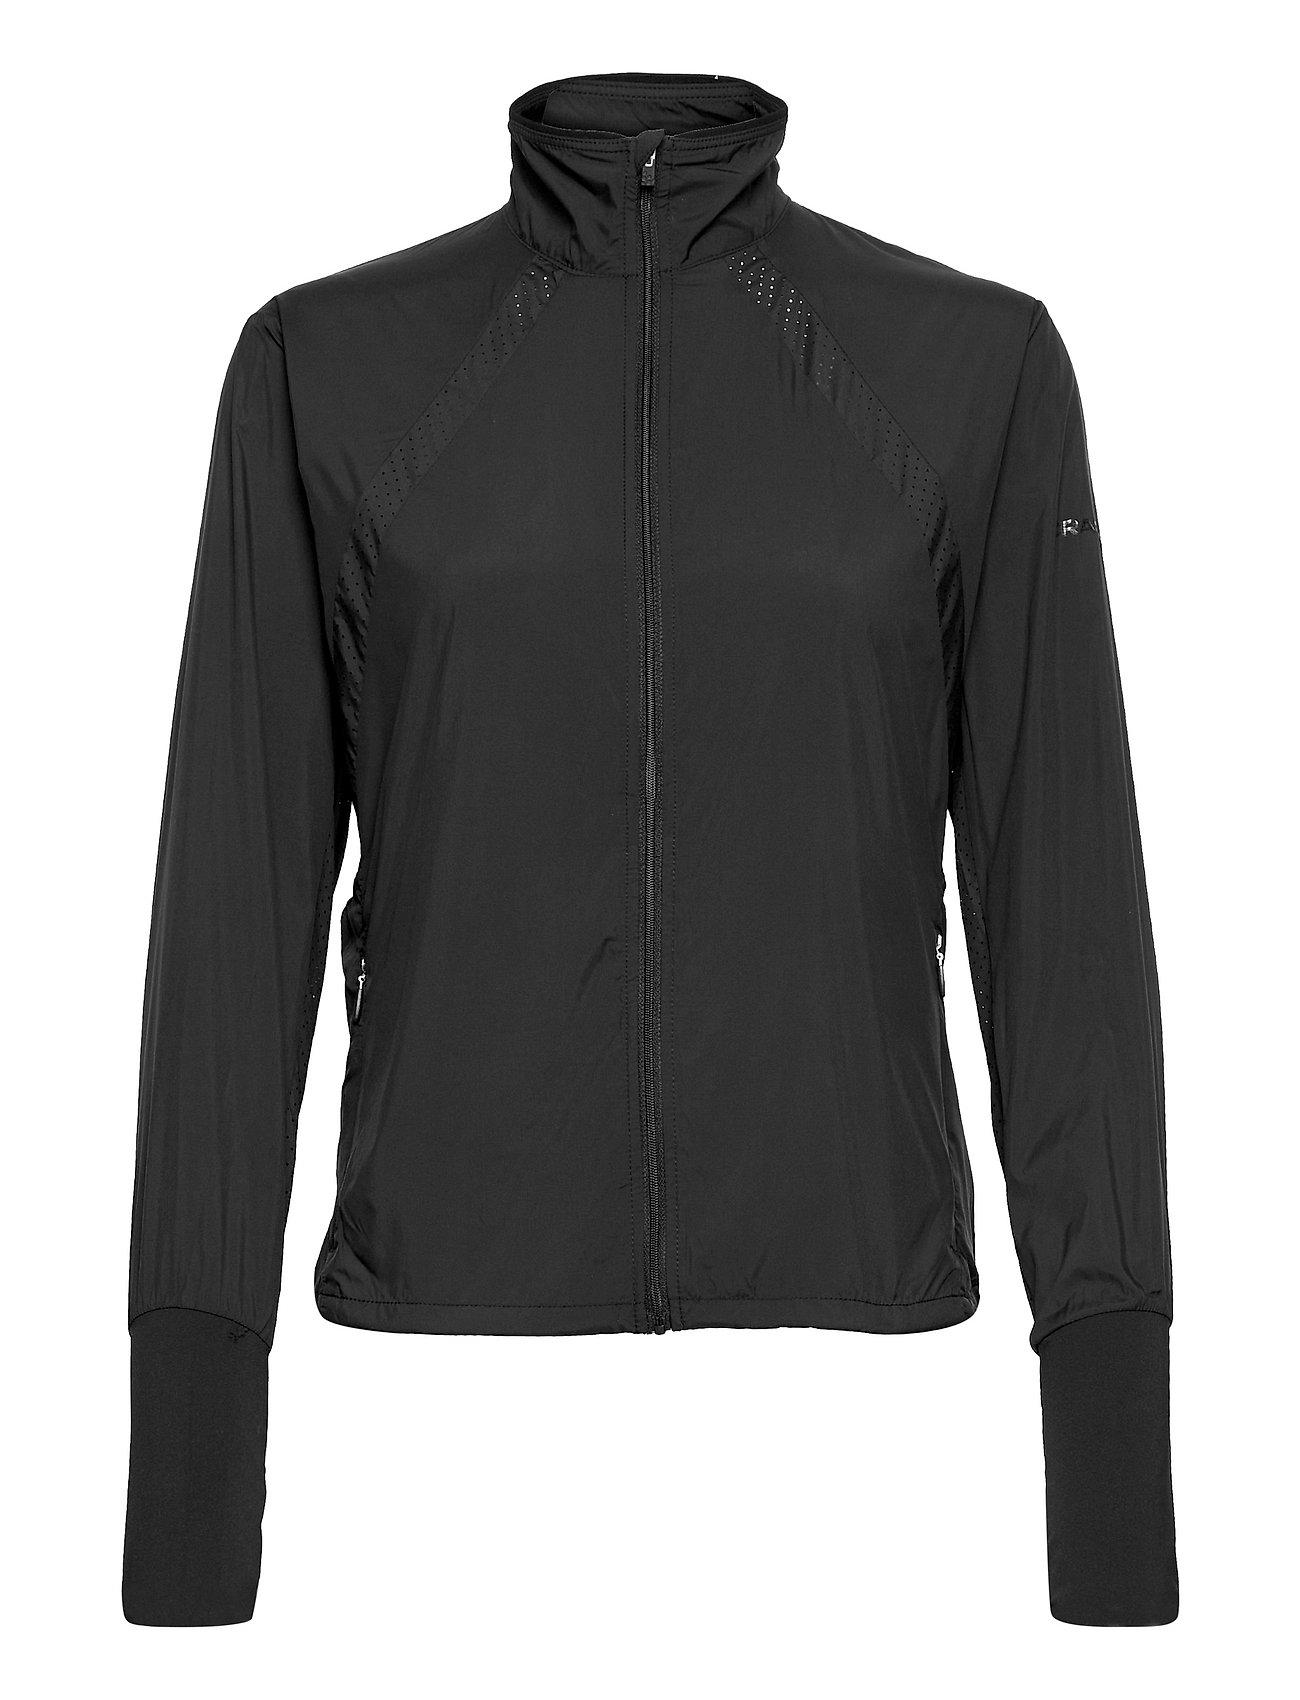 Adv Essence Wind Jacket W Outerwear Sport Jackets Sort Craft